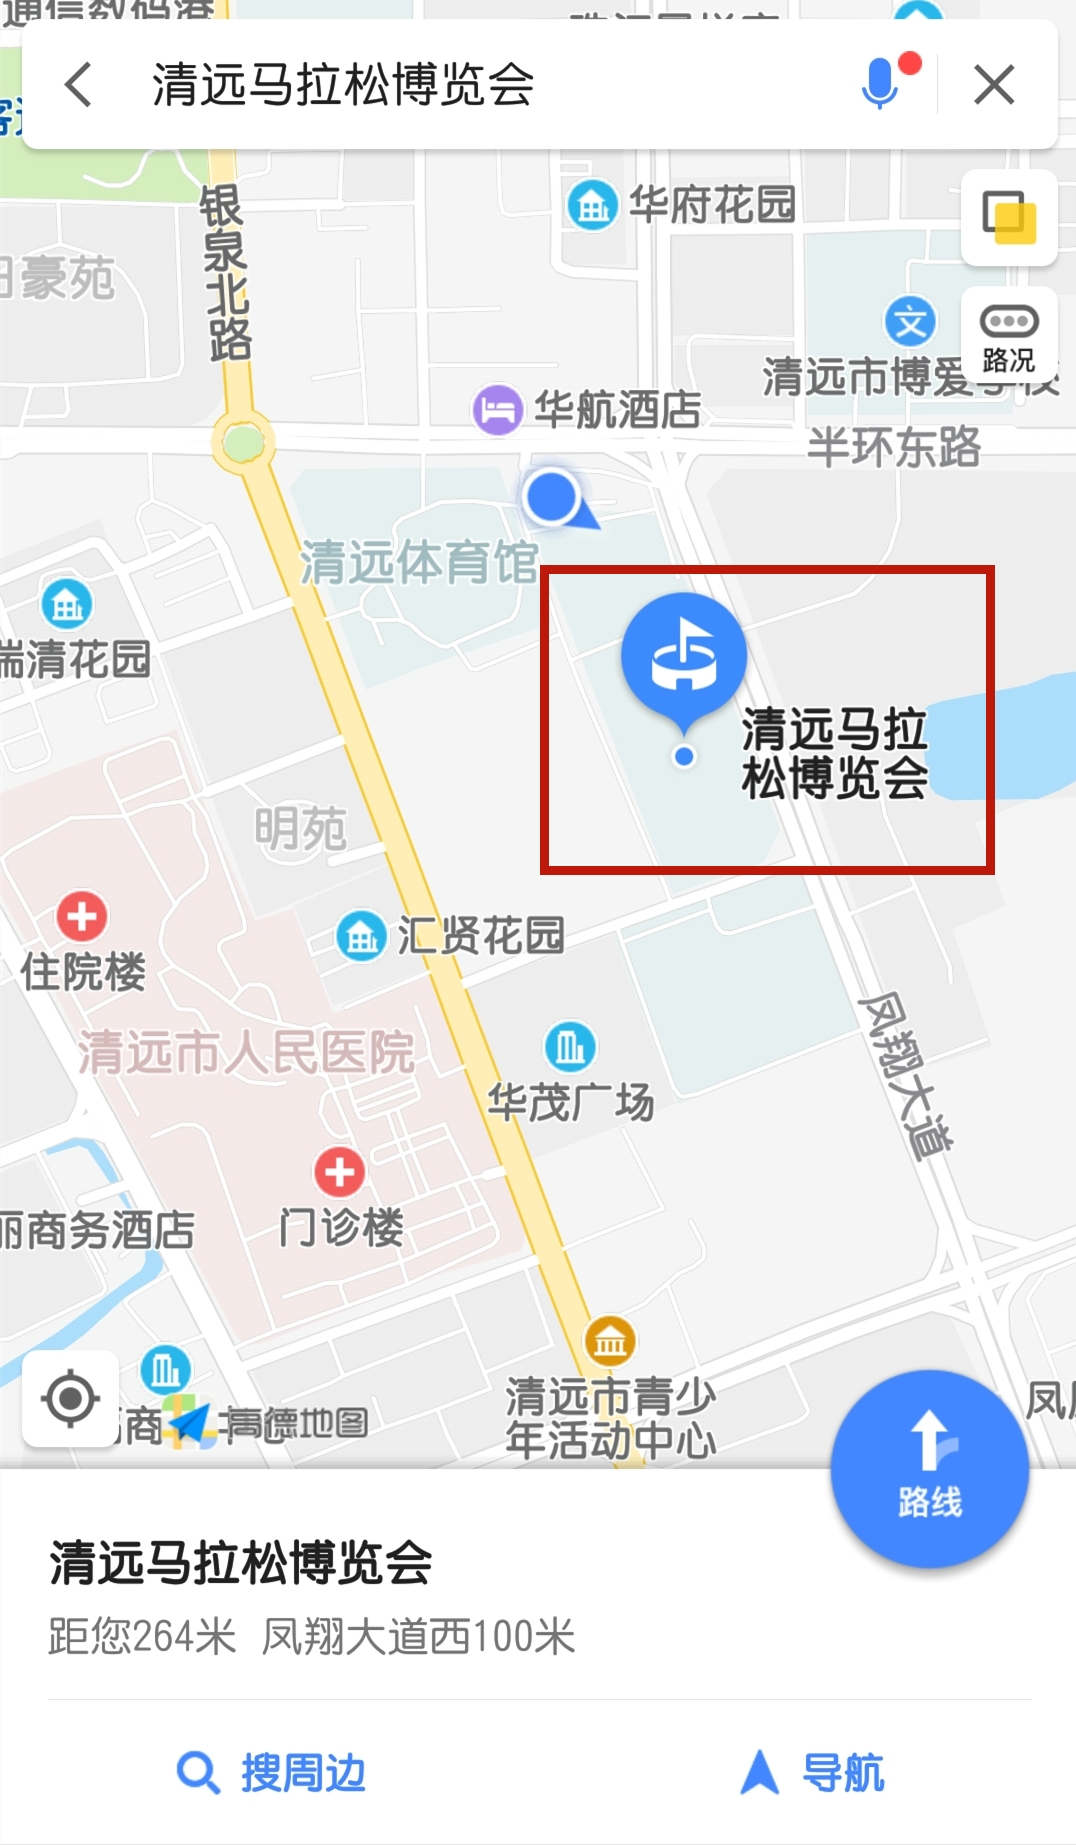 http://img.sport-china.cn/180310005aa2b43d1d8ec.jpeg